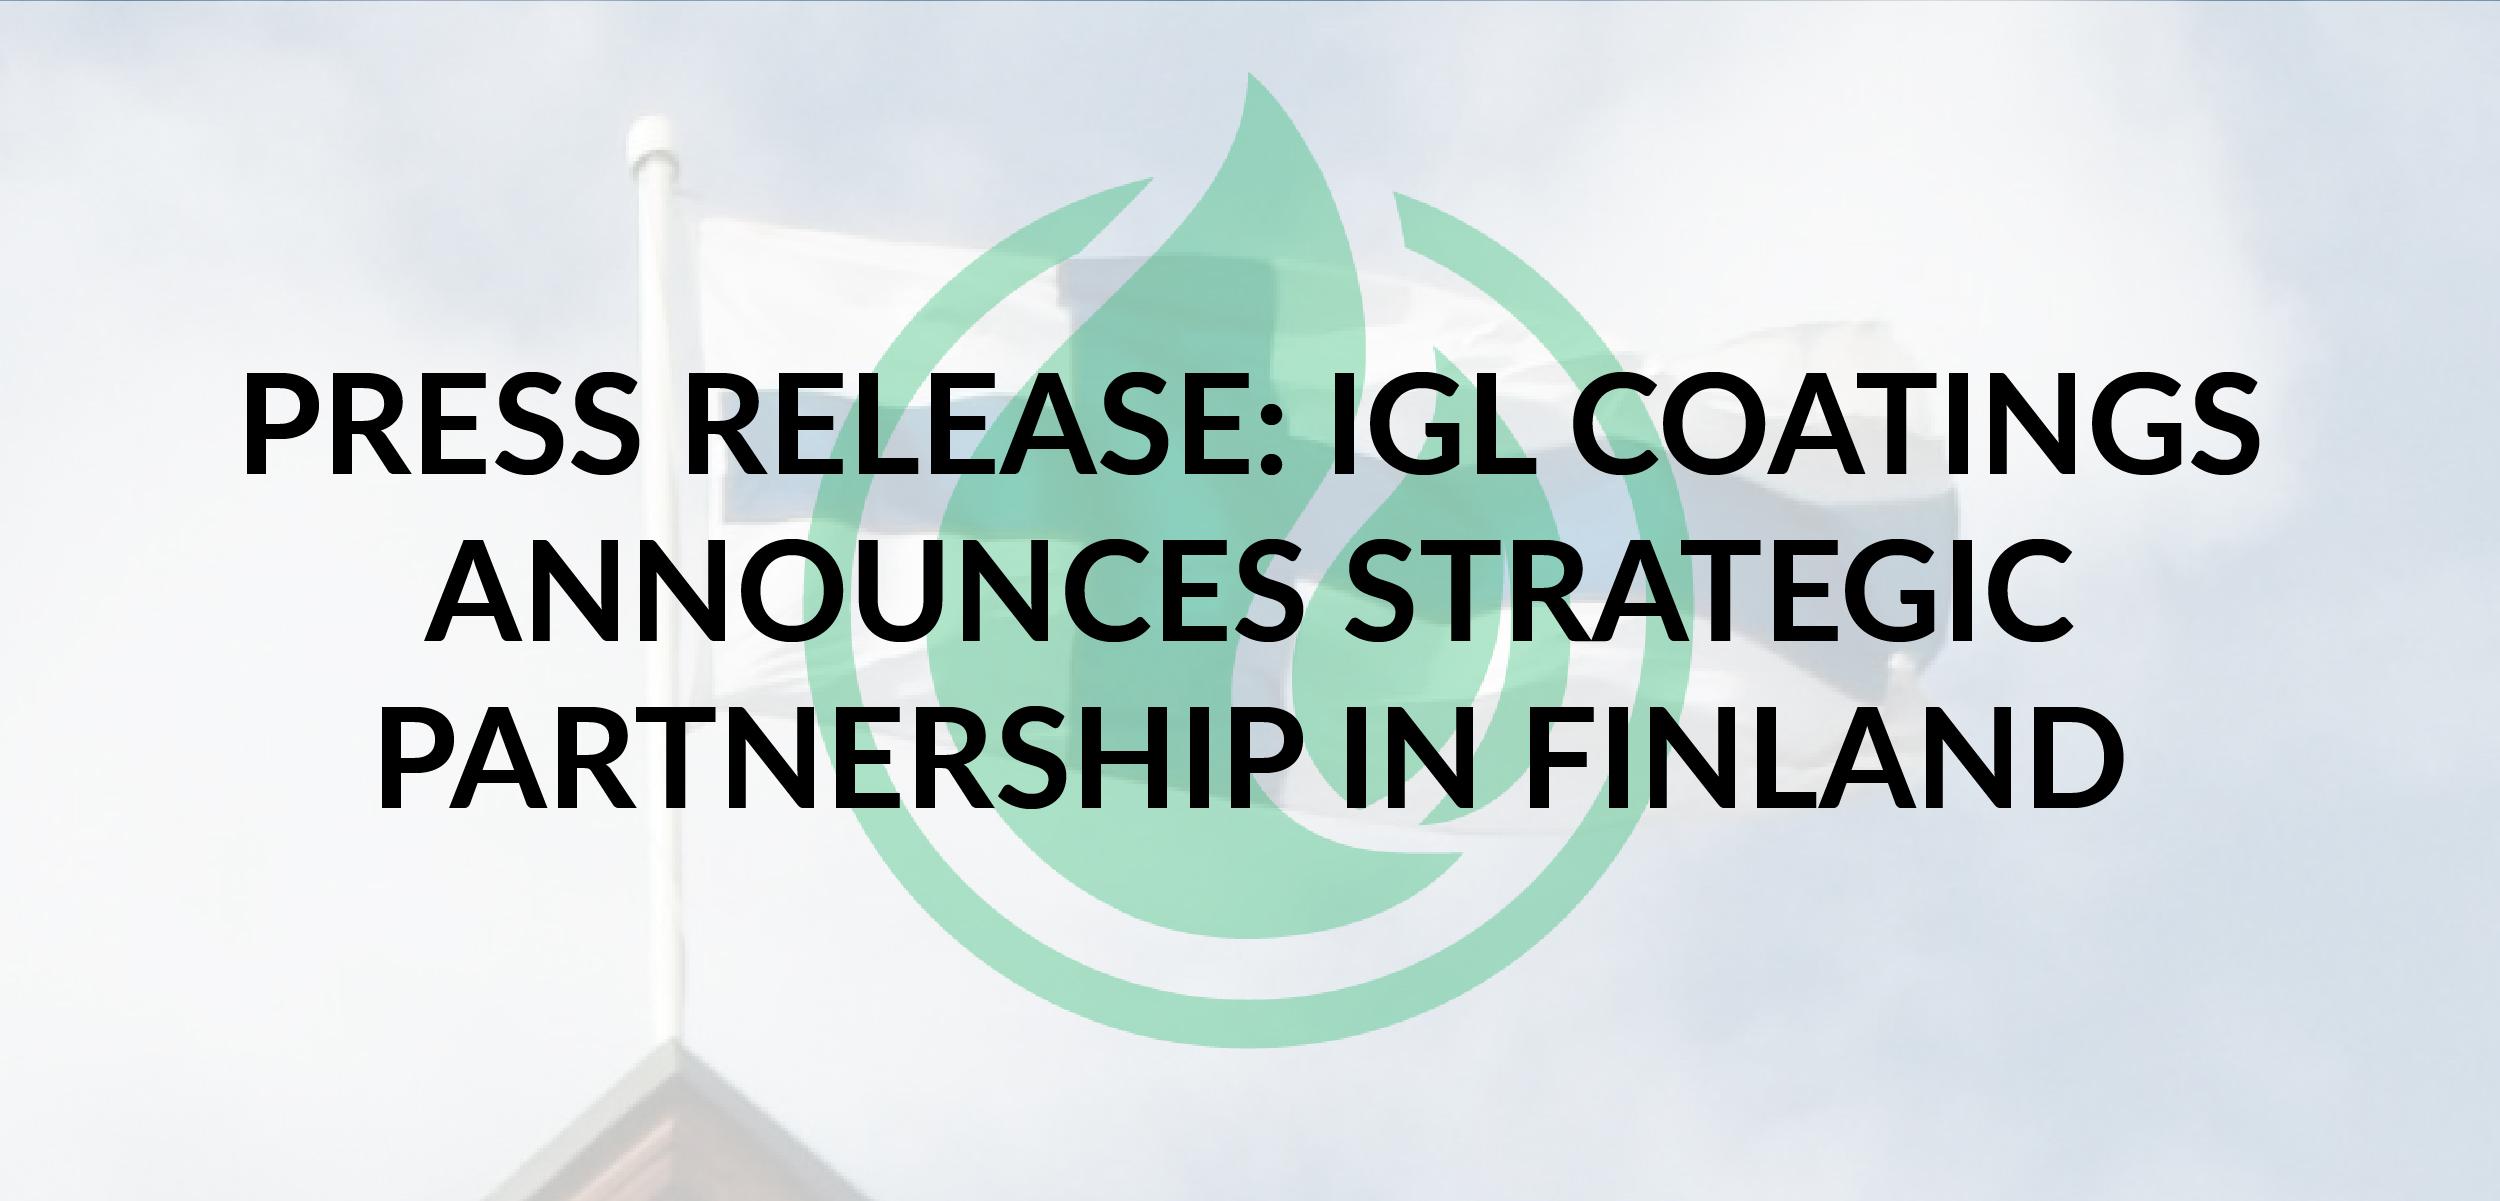 Press Release: IGL Coatings Announces Strategic Partnership In Finland